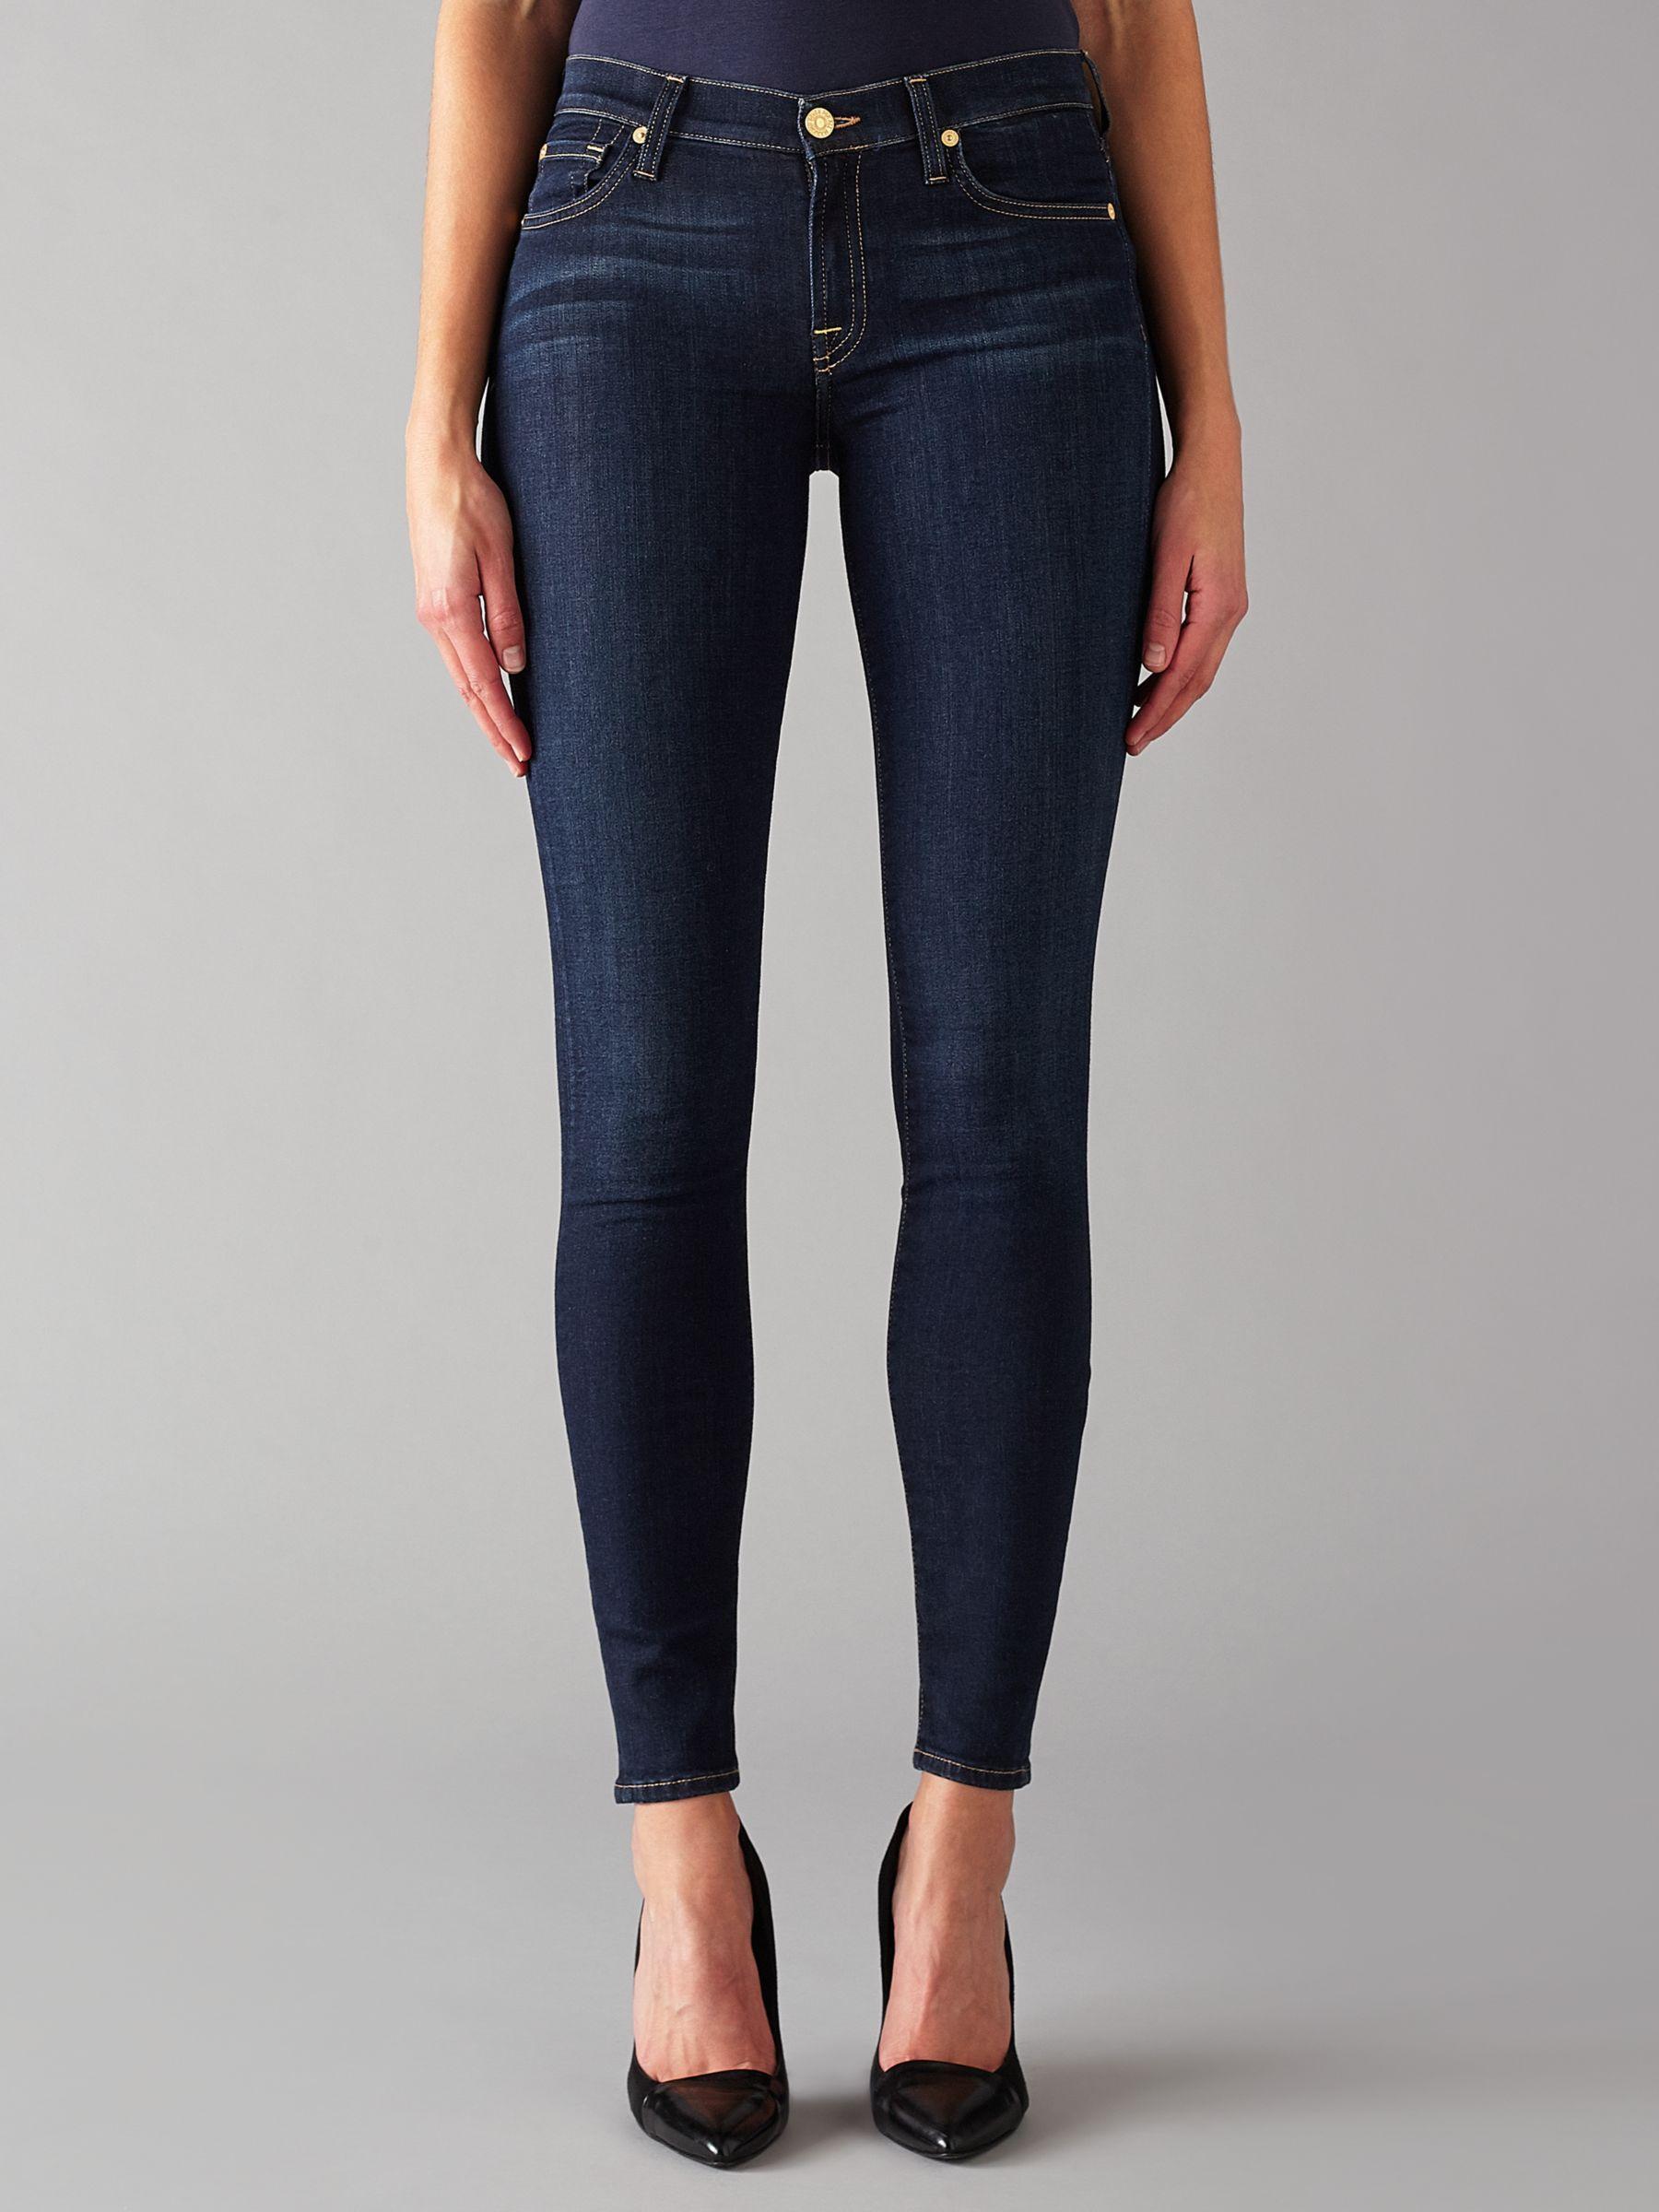 7 For All Mankind The Skinny B Air Jeans Rinsed Indigo Denim